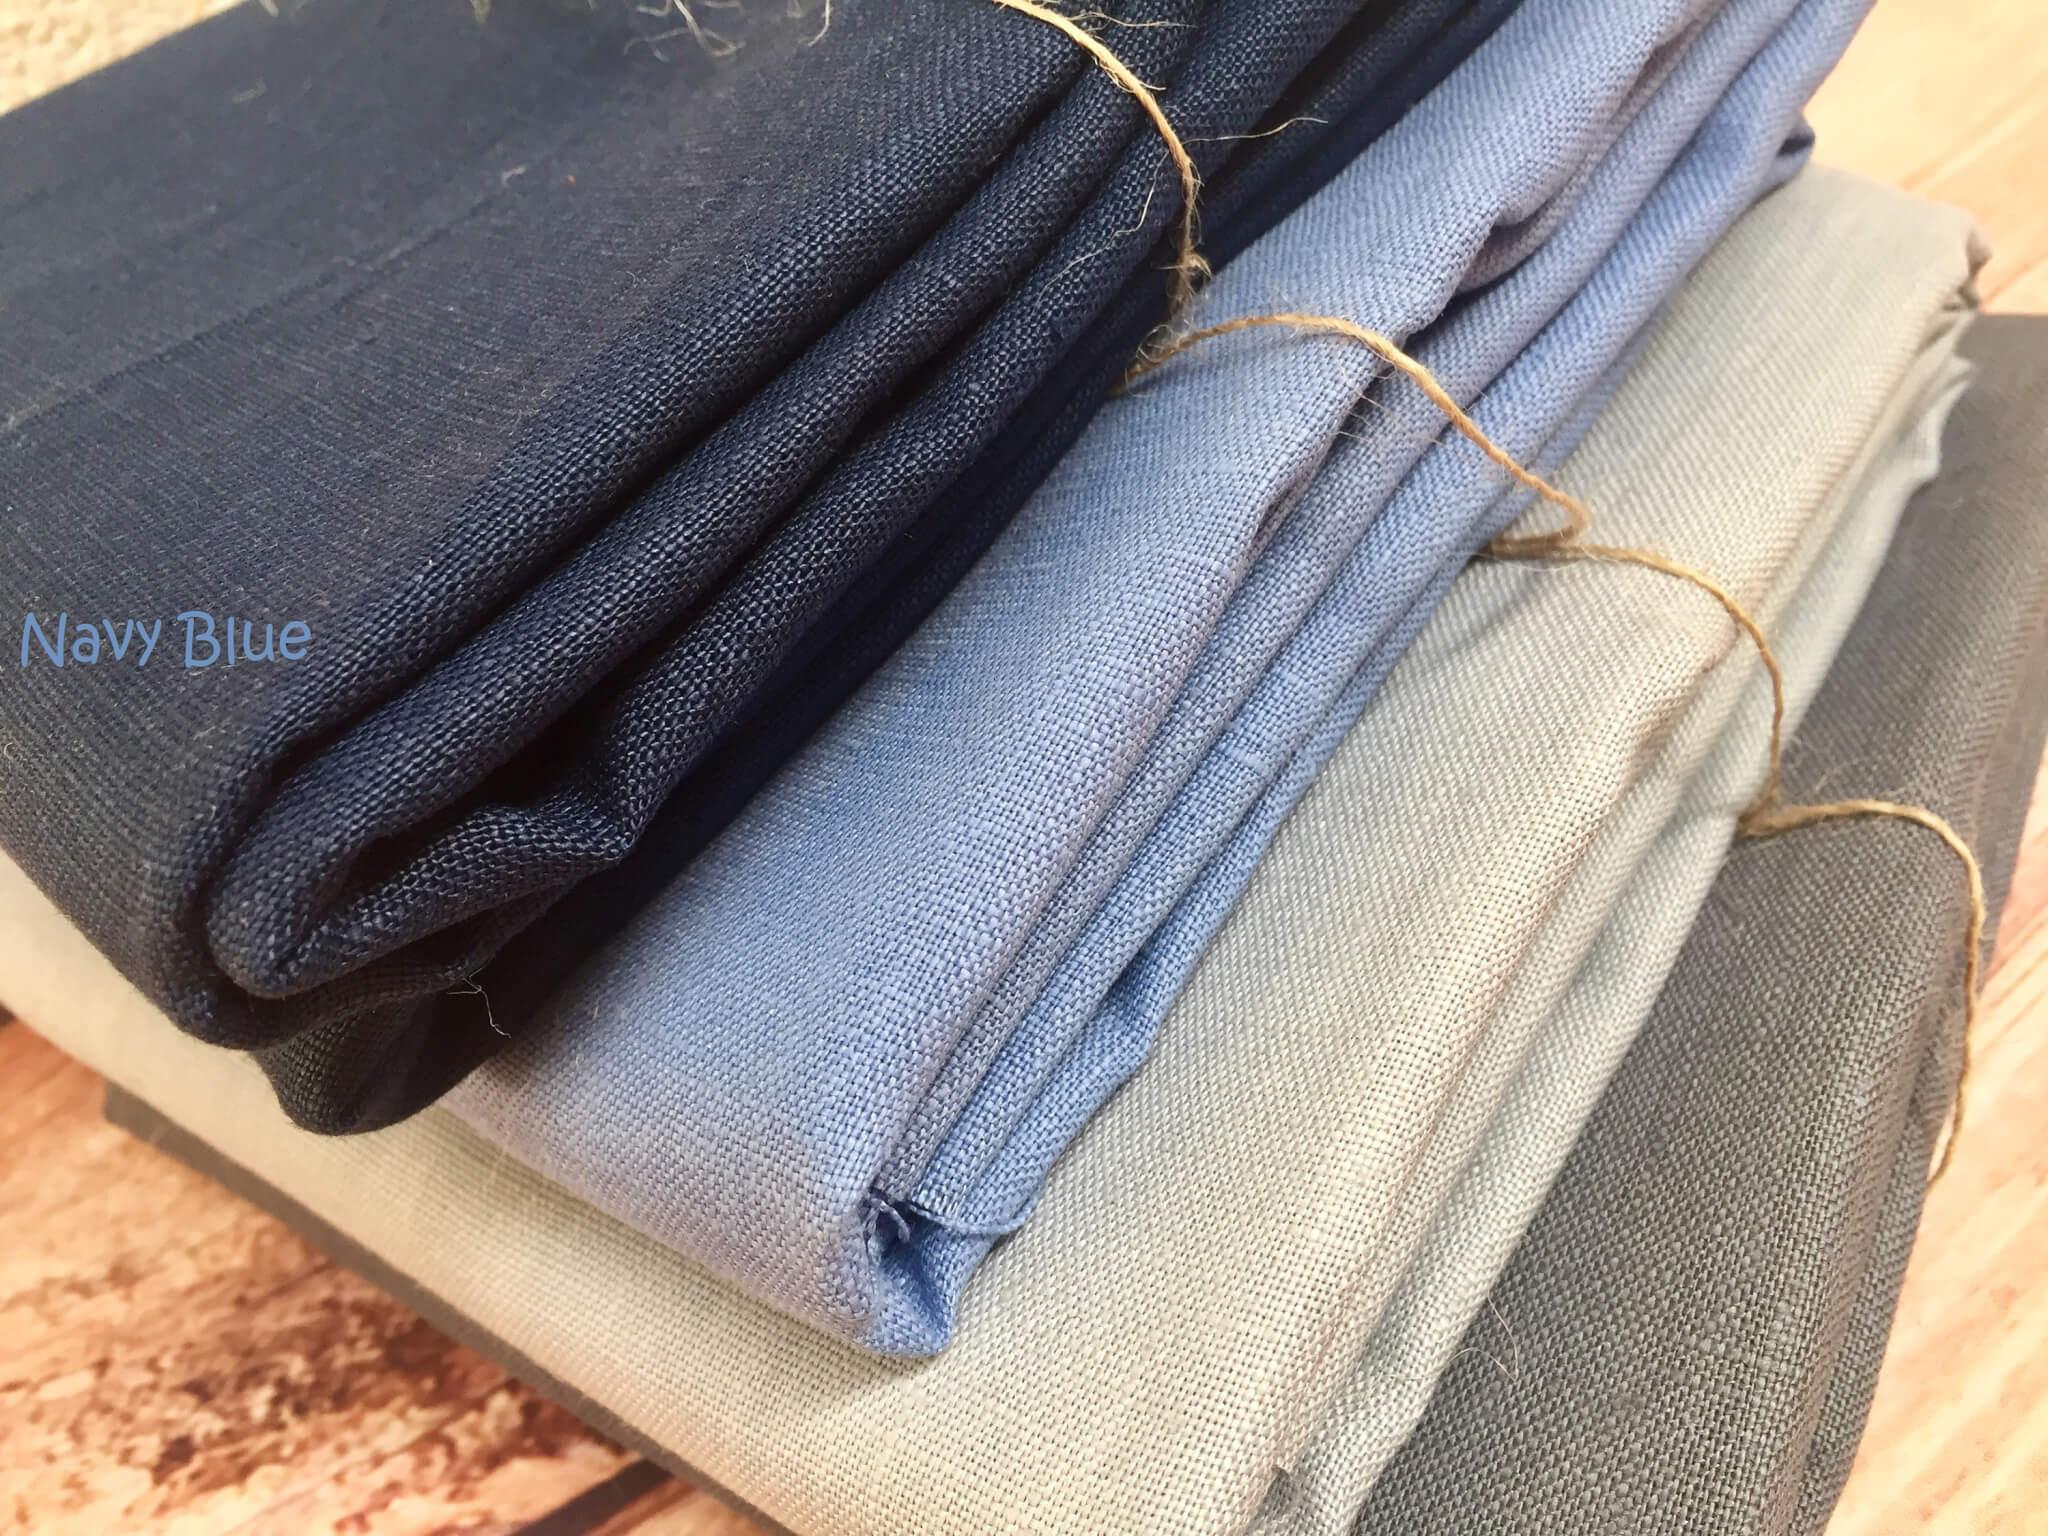 soft-linen-fabric-material-100-linen-for-home-decor-curtains-clothes-140cm-wide-plain-navy-blue-5aef61dc1.jpg